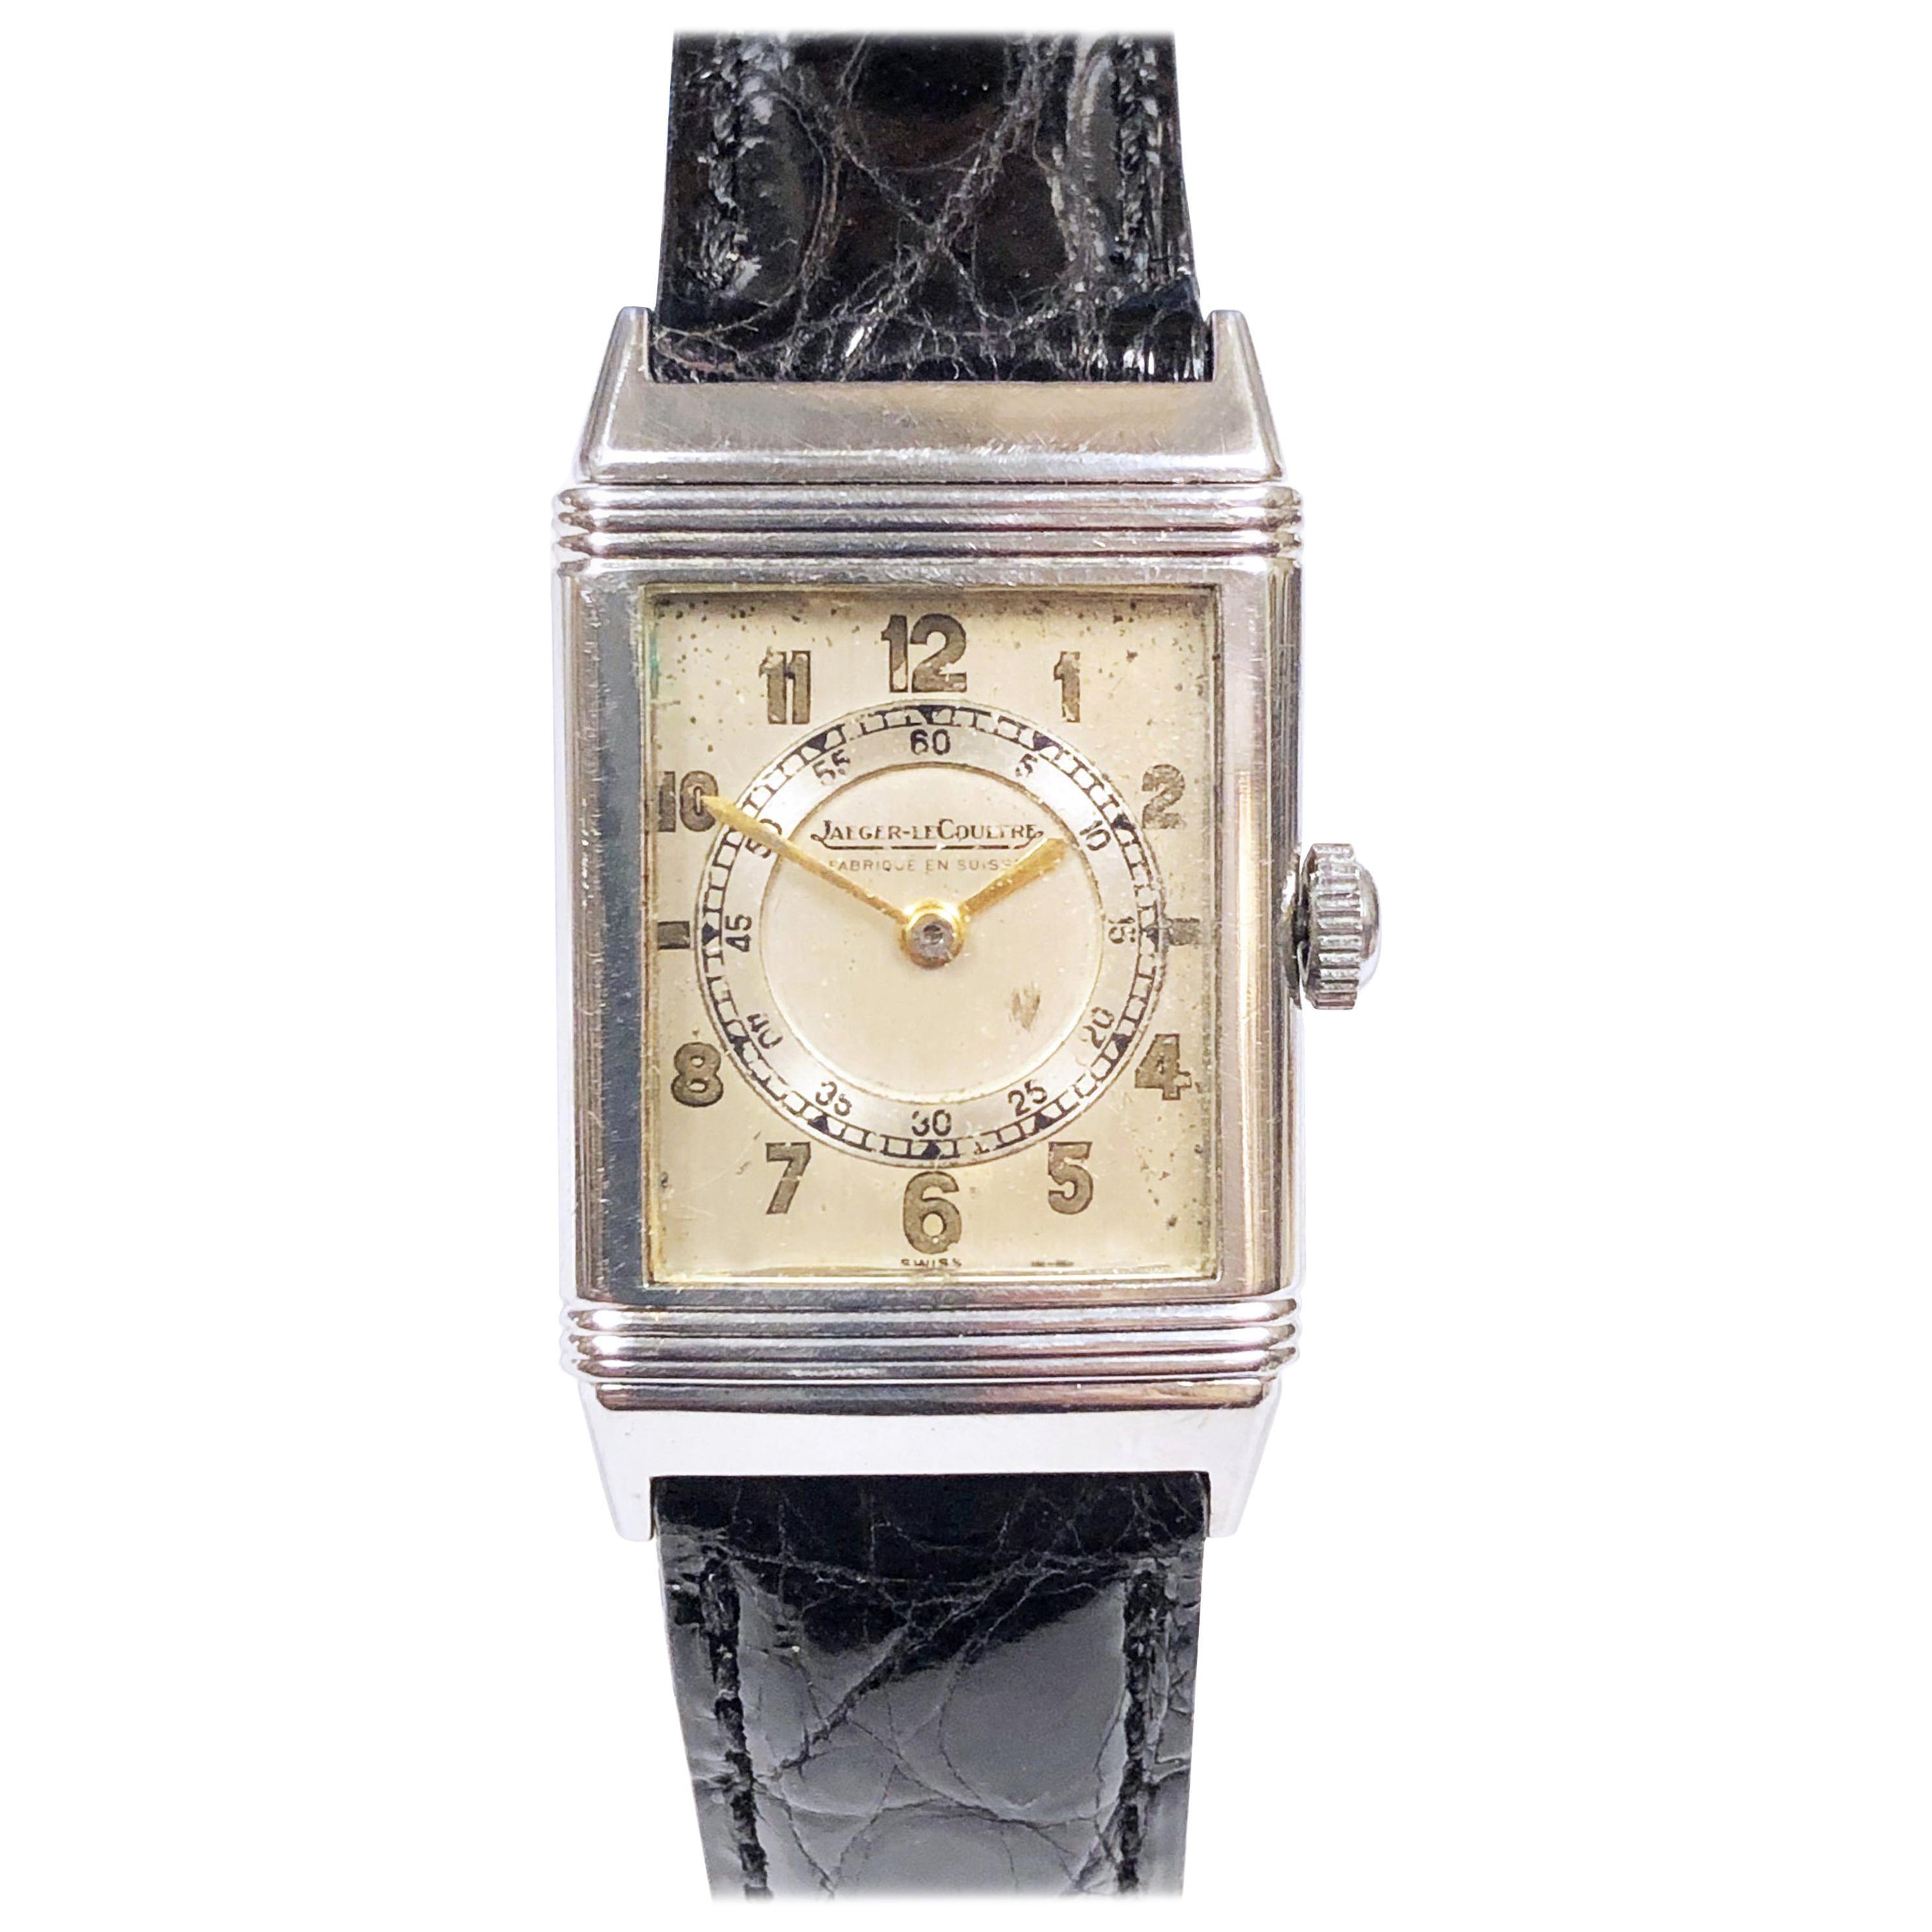 1930s Jaeger Le-Coultre Steel Reverso Mechanical Wristwatch